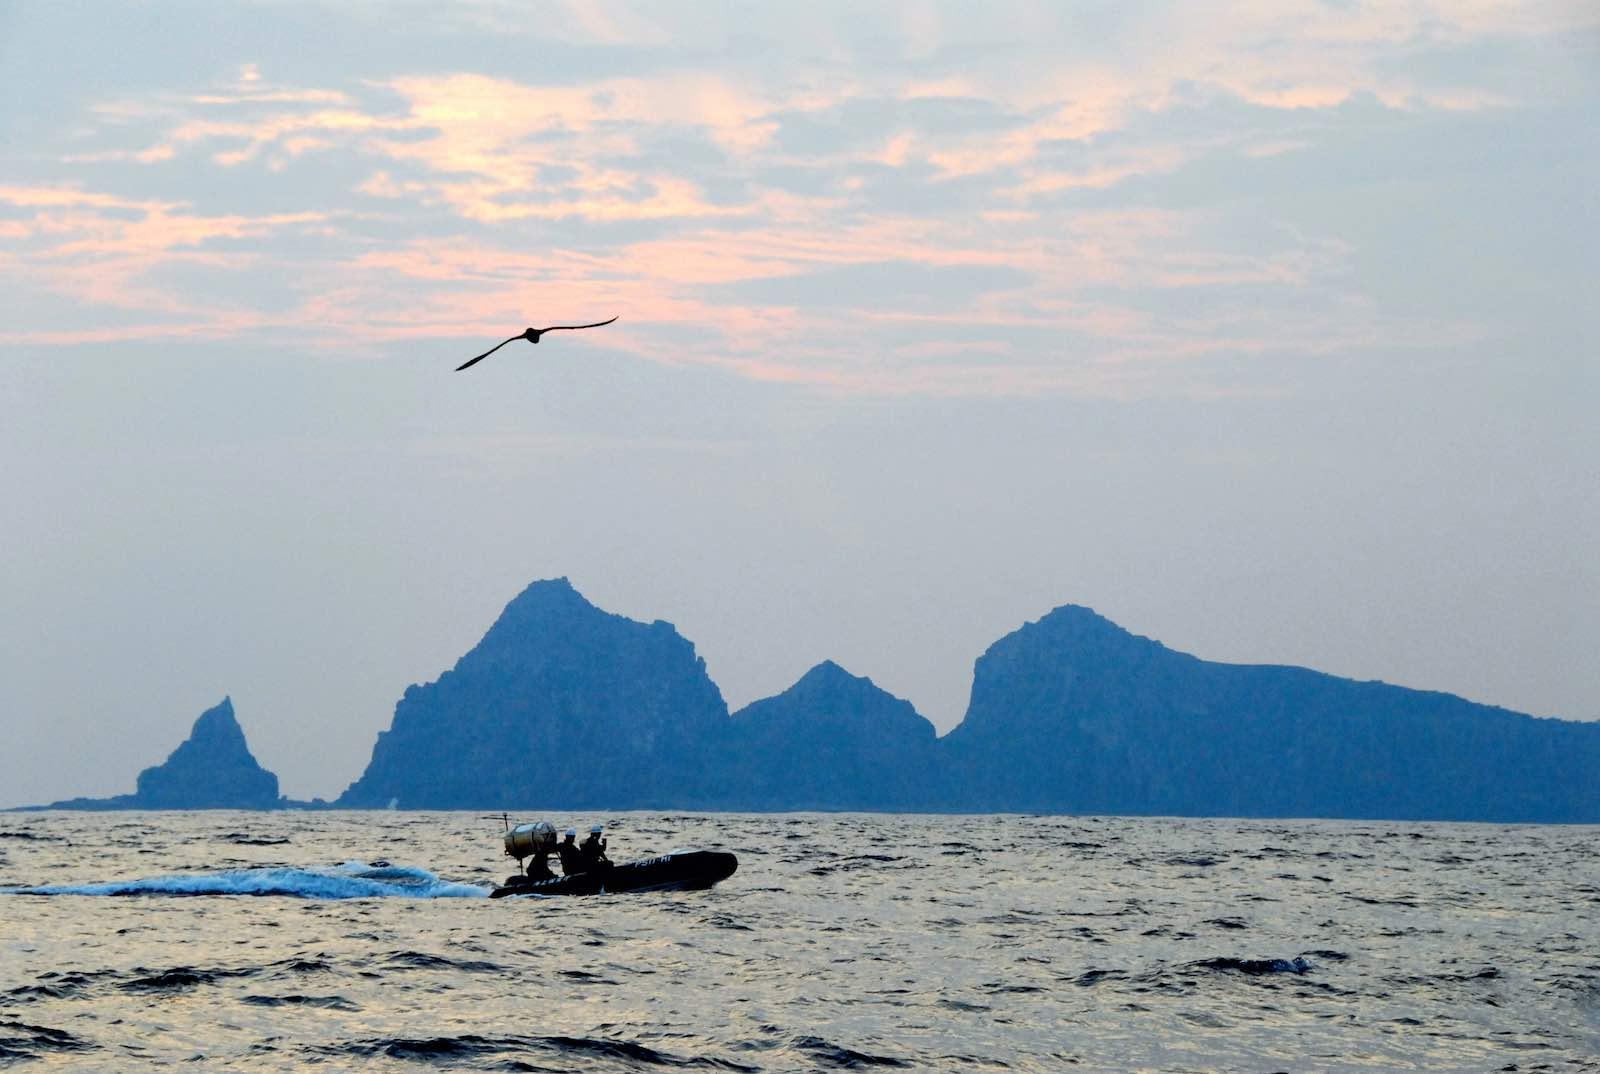 A Japan Coast Guard boat patrols near Uotsuri island, one of the disputed Senkaku/Daioyu Islands, September 2012 (Asahi Shimbun via Getty Images)